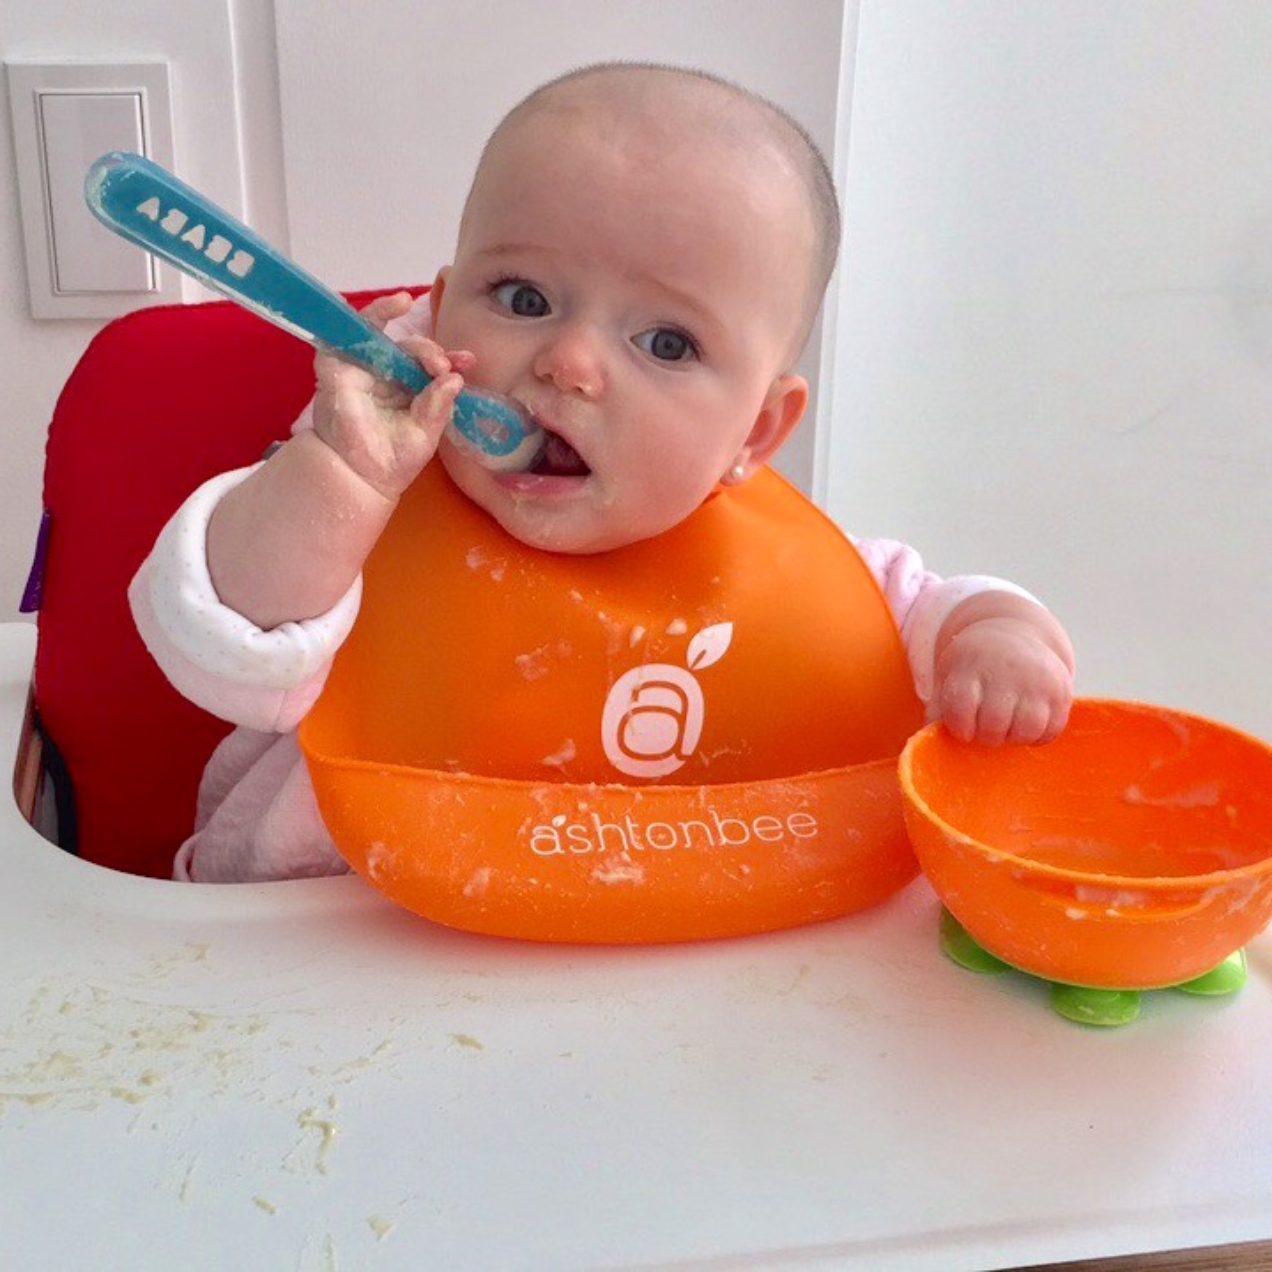 tips de una mamá para empezar Baby-Led Weaning